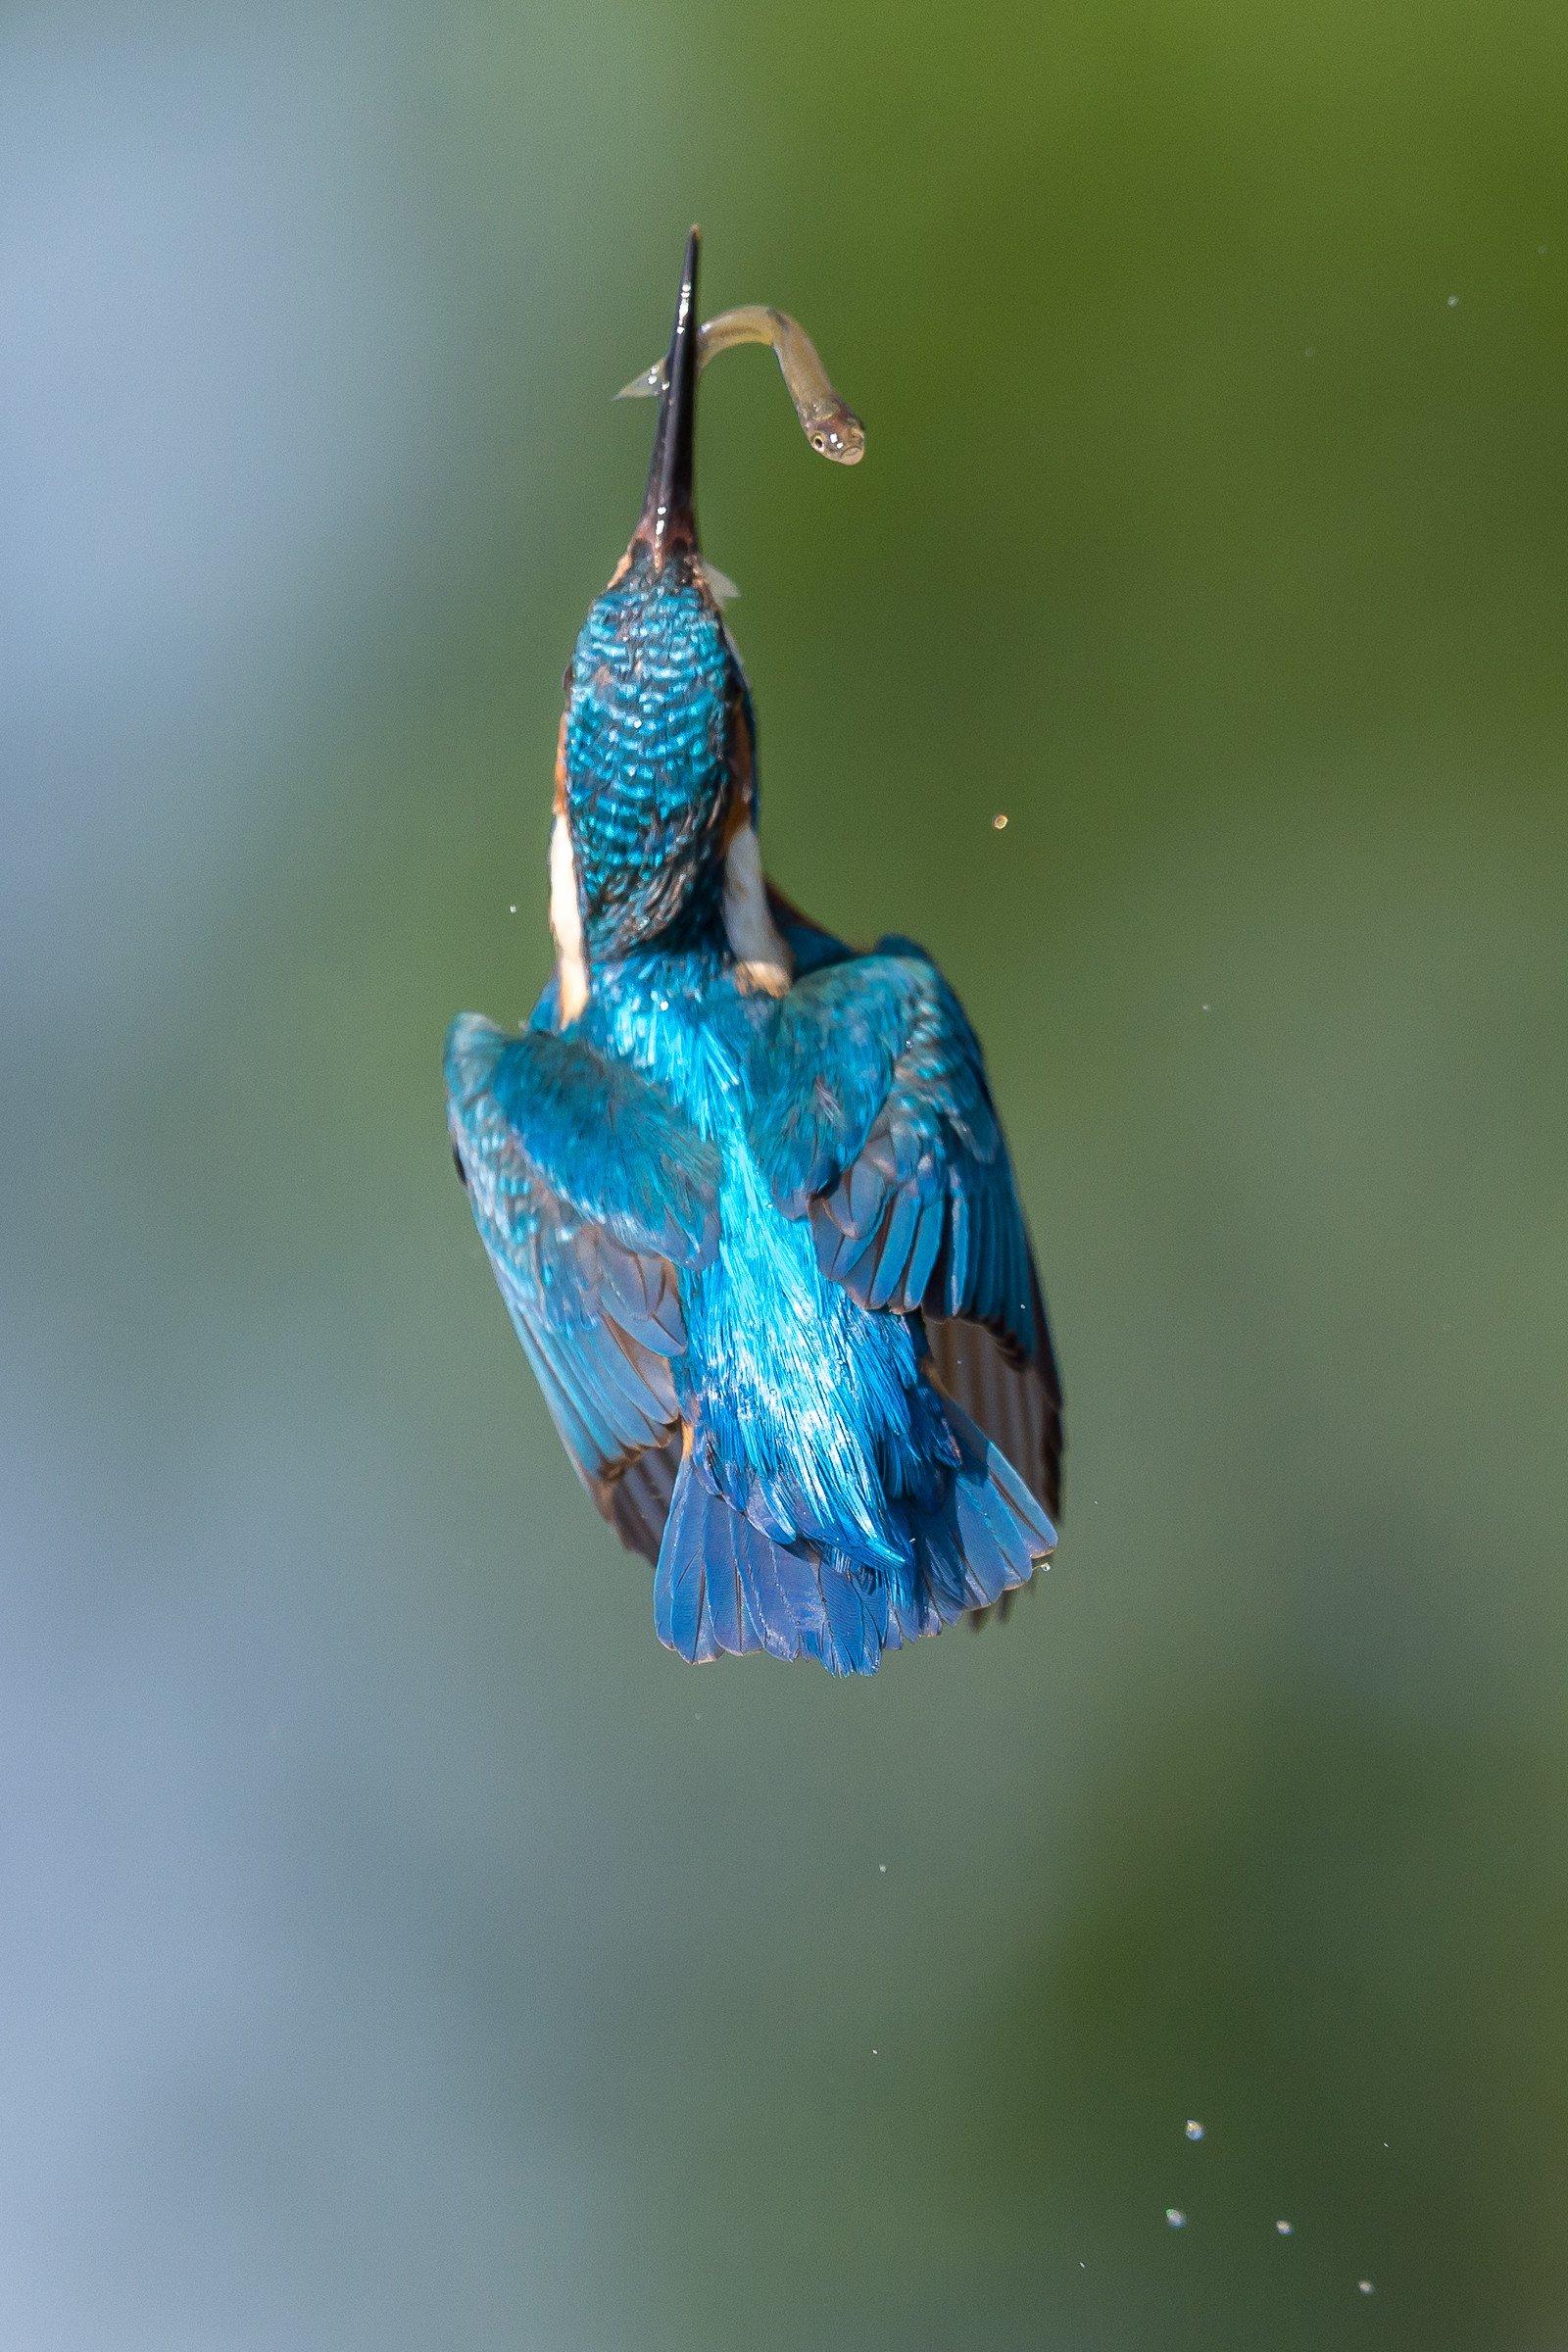 vogel BHW 0546